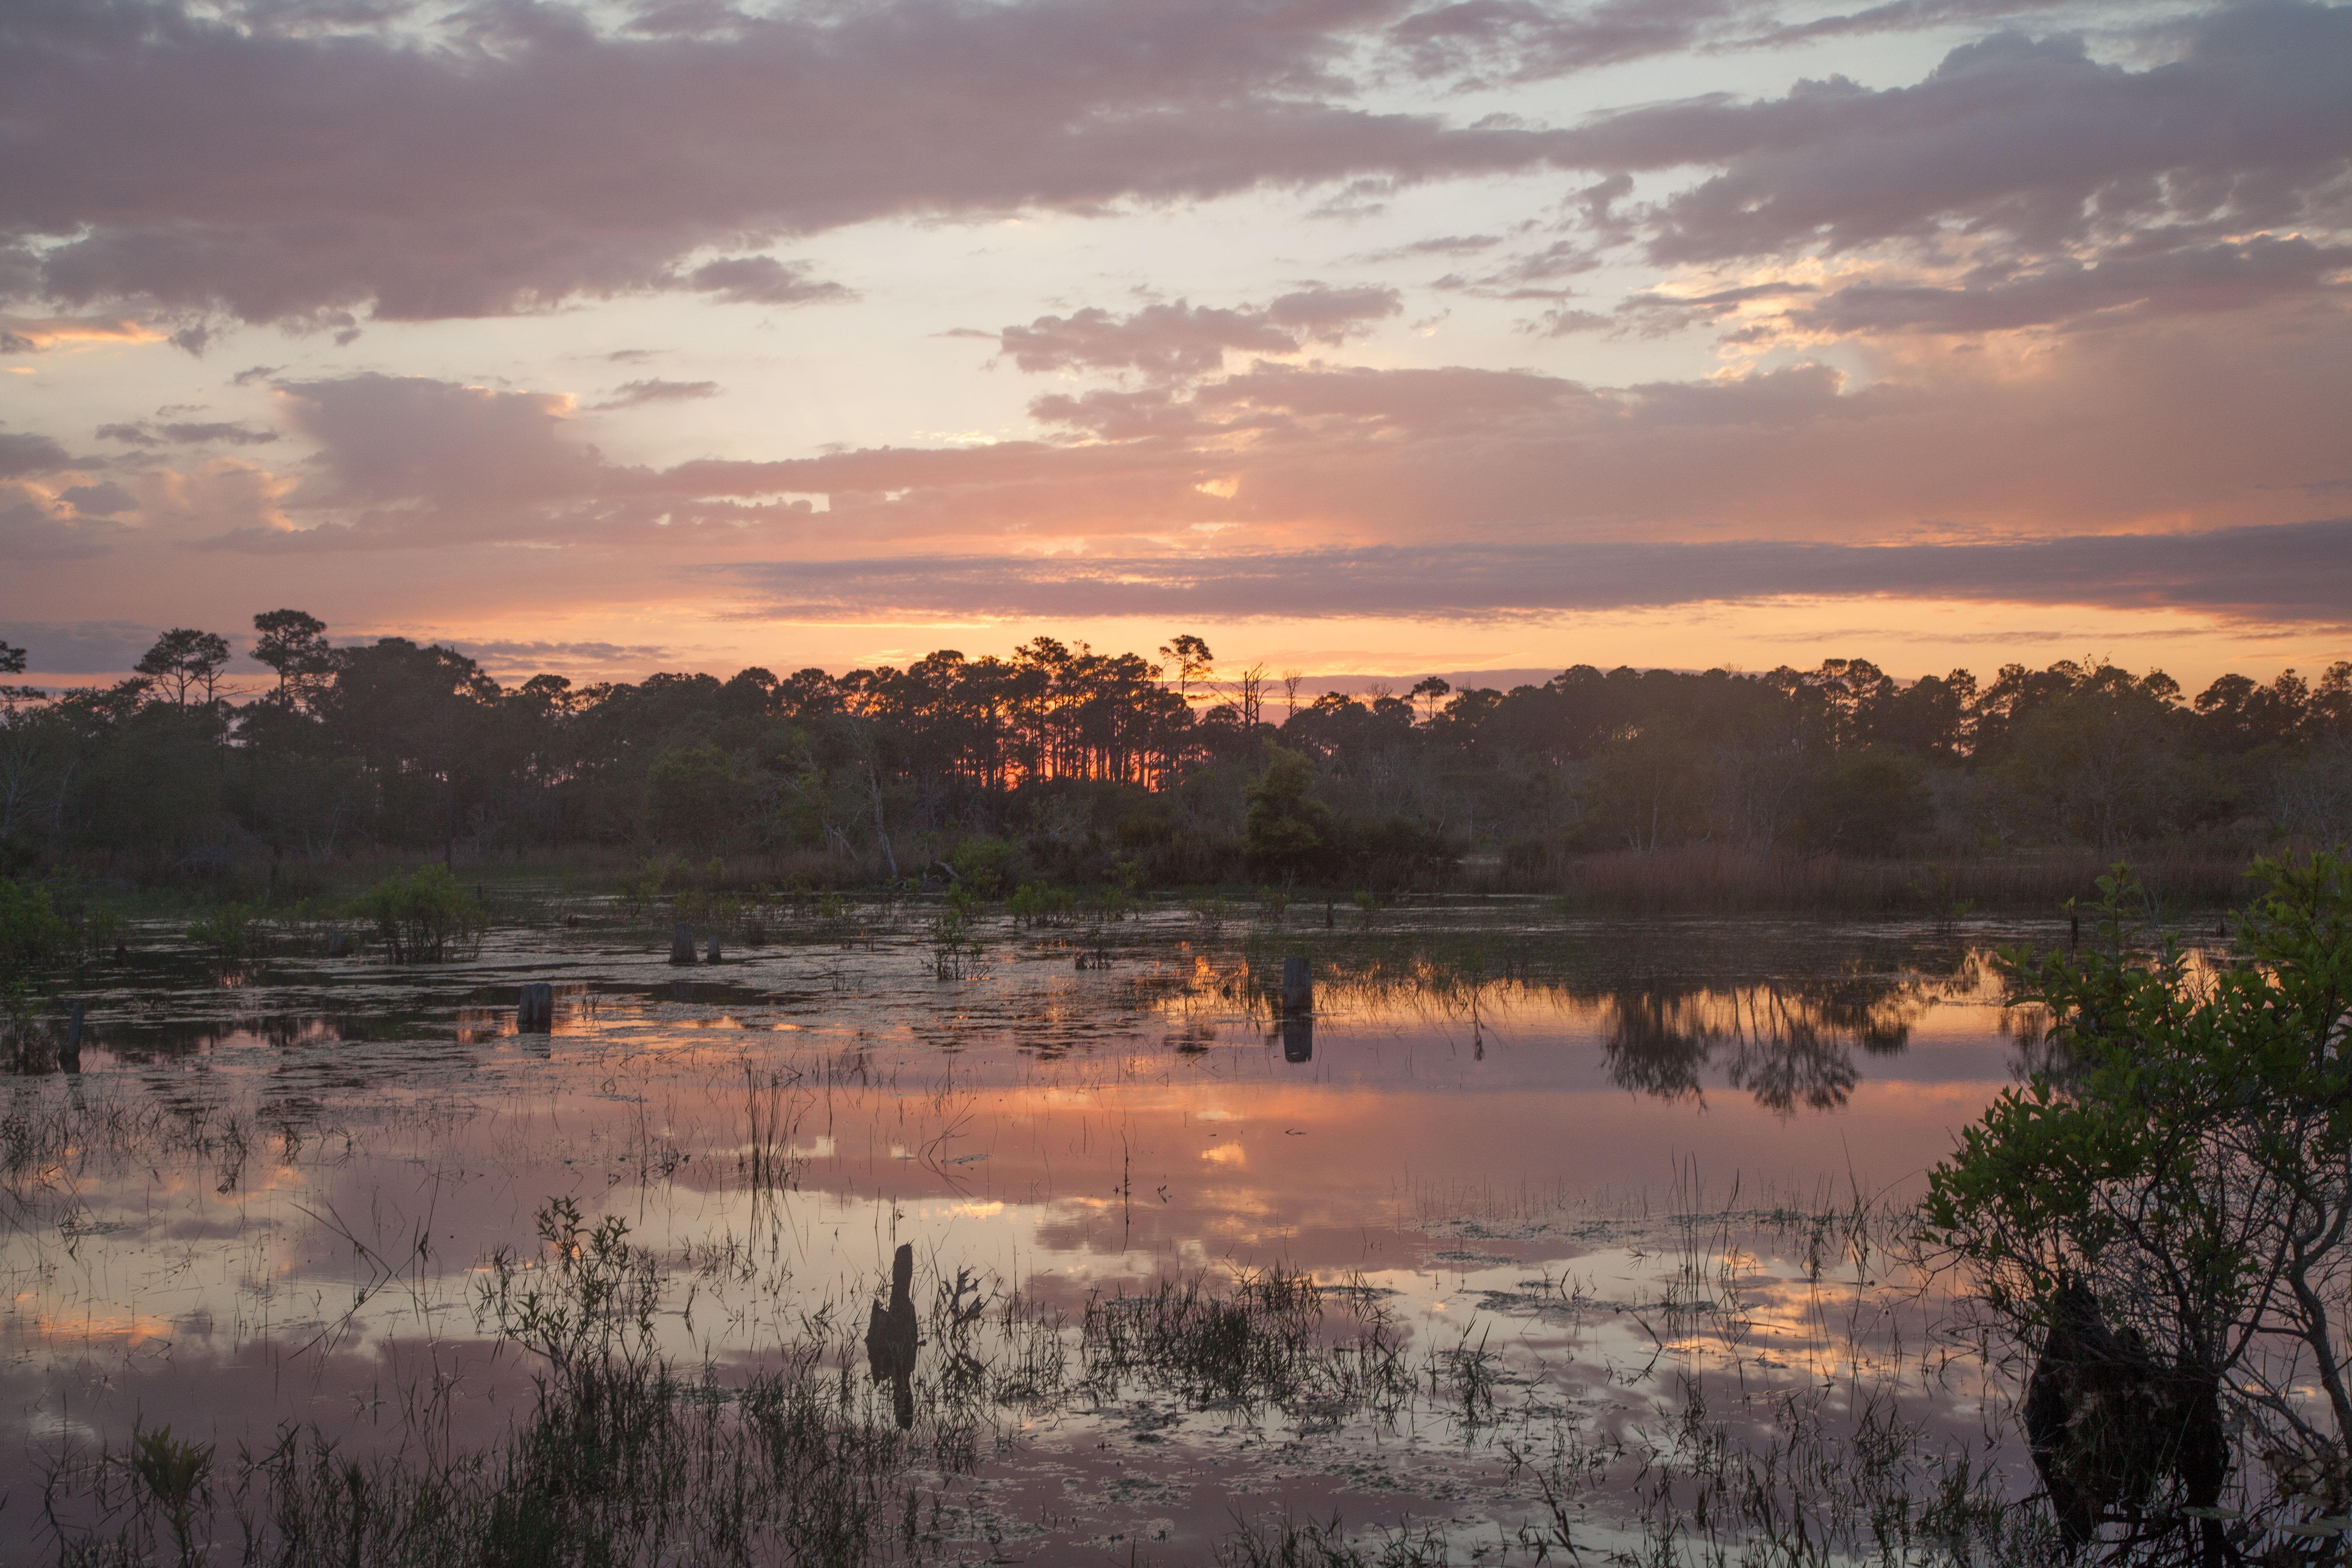 Photo of Choctawhatchee Bay Estuary at sunset